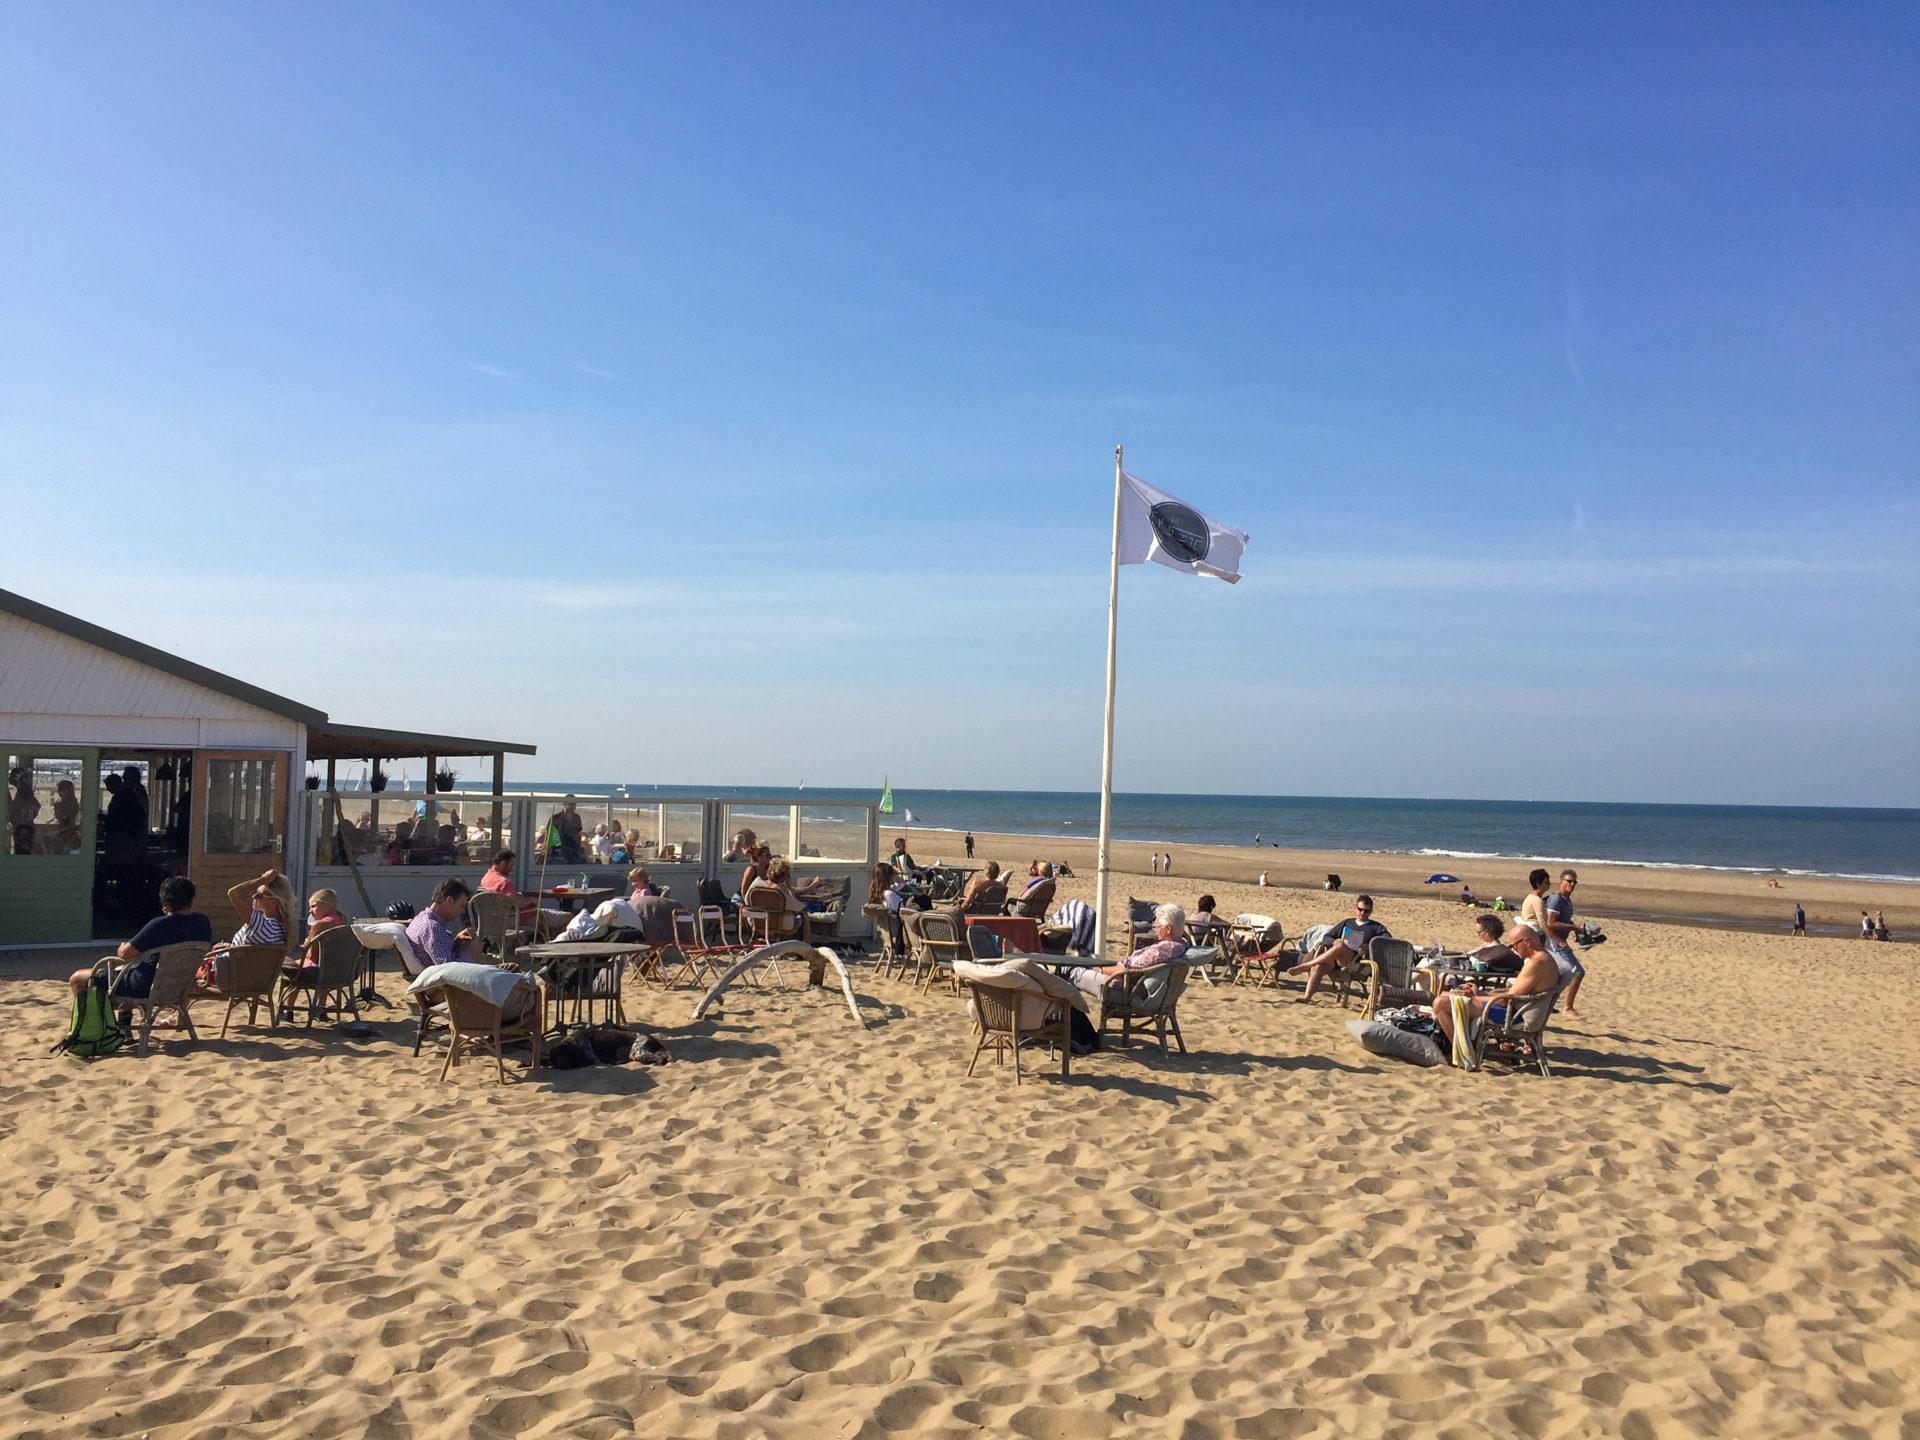 Het Puntje ist mein Favorit unter den Strandpavillons in Den Haag